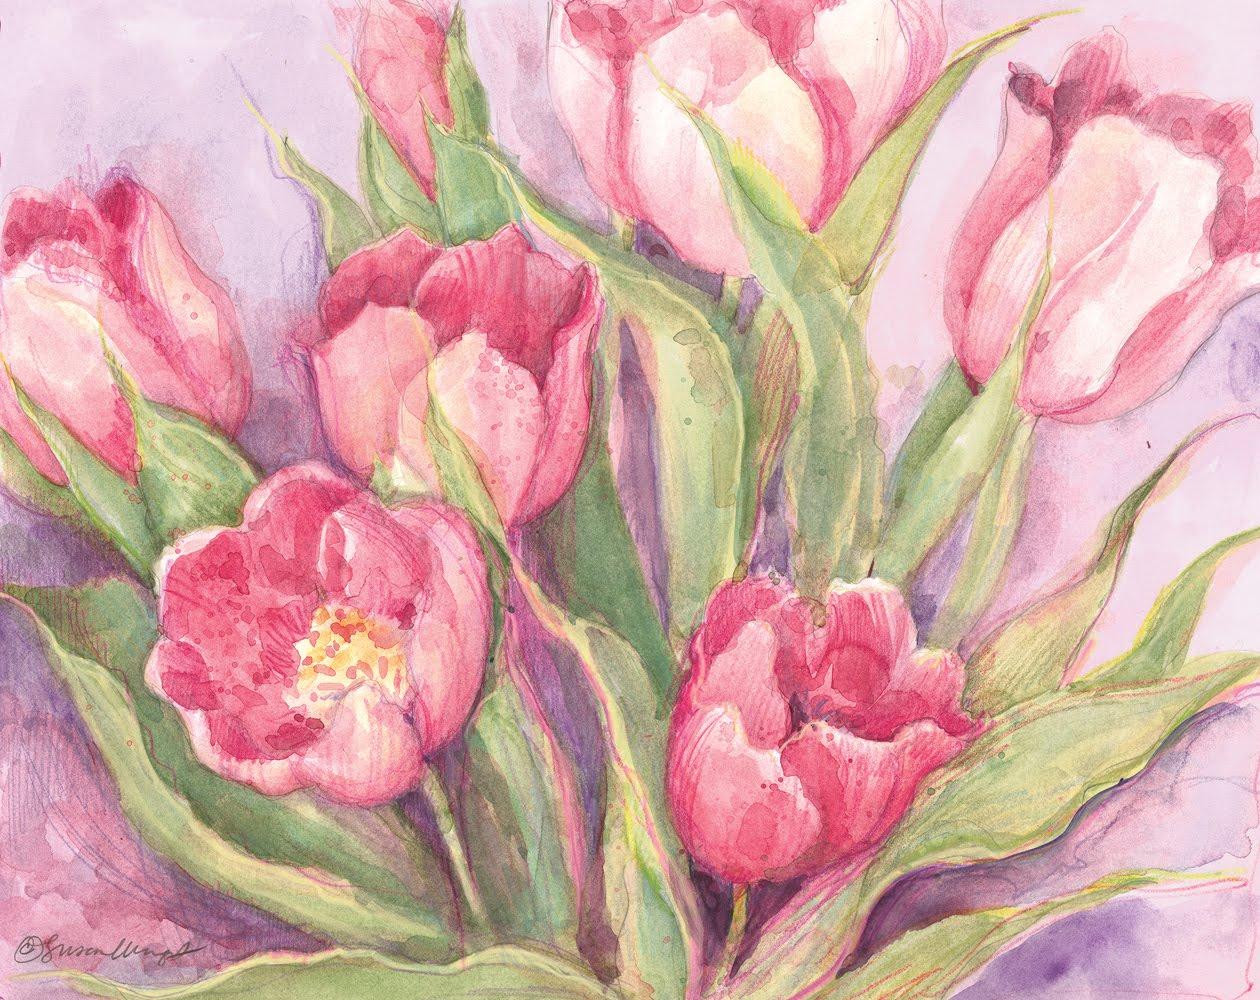 Handmade & Heavenly by Nora: In Memory Of